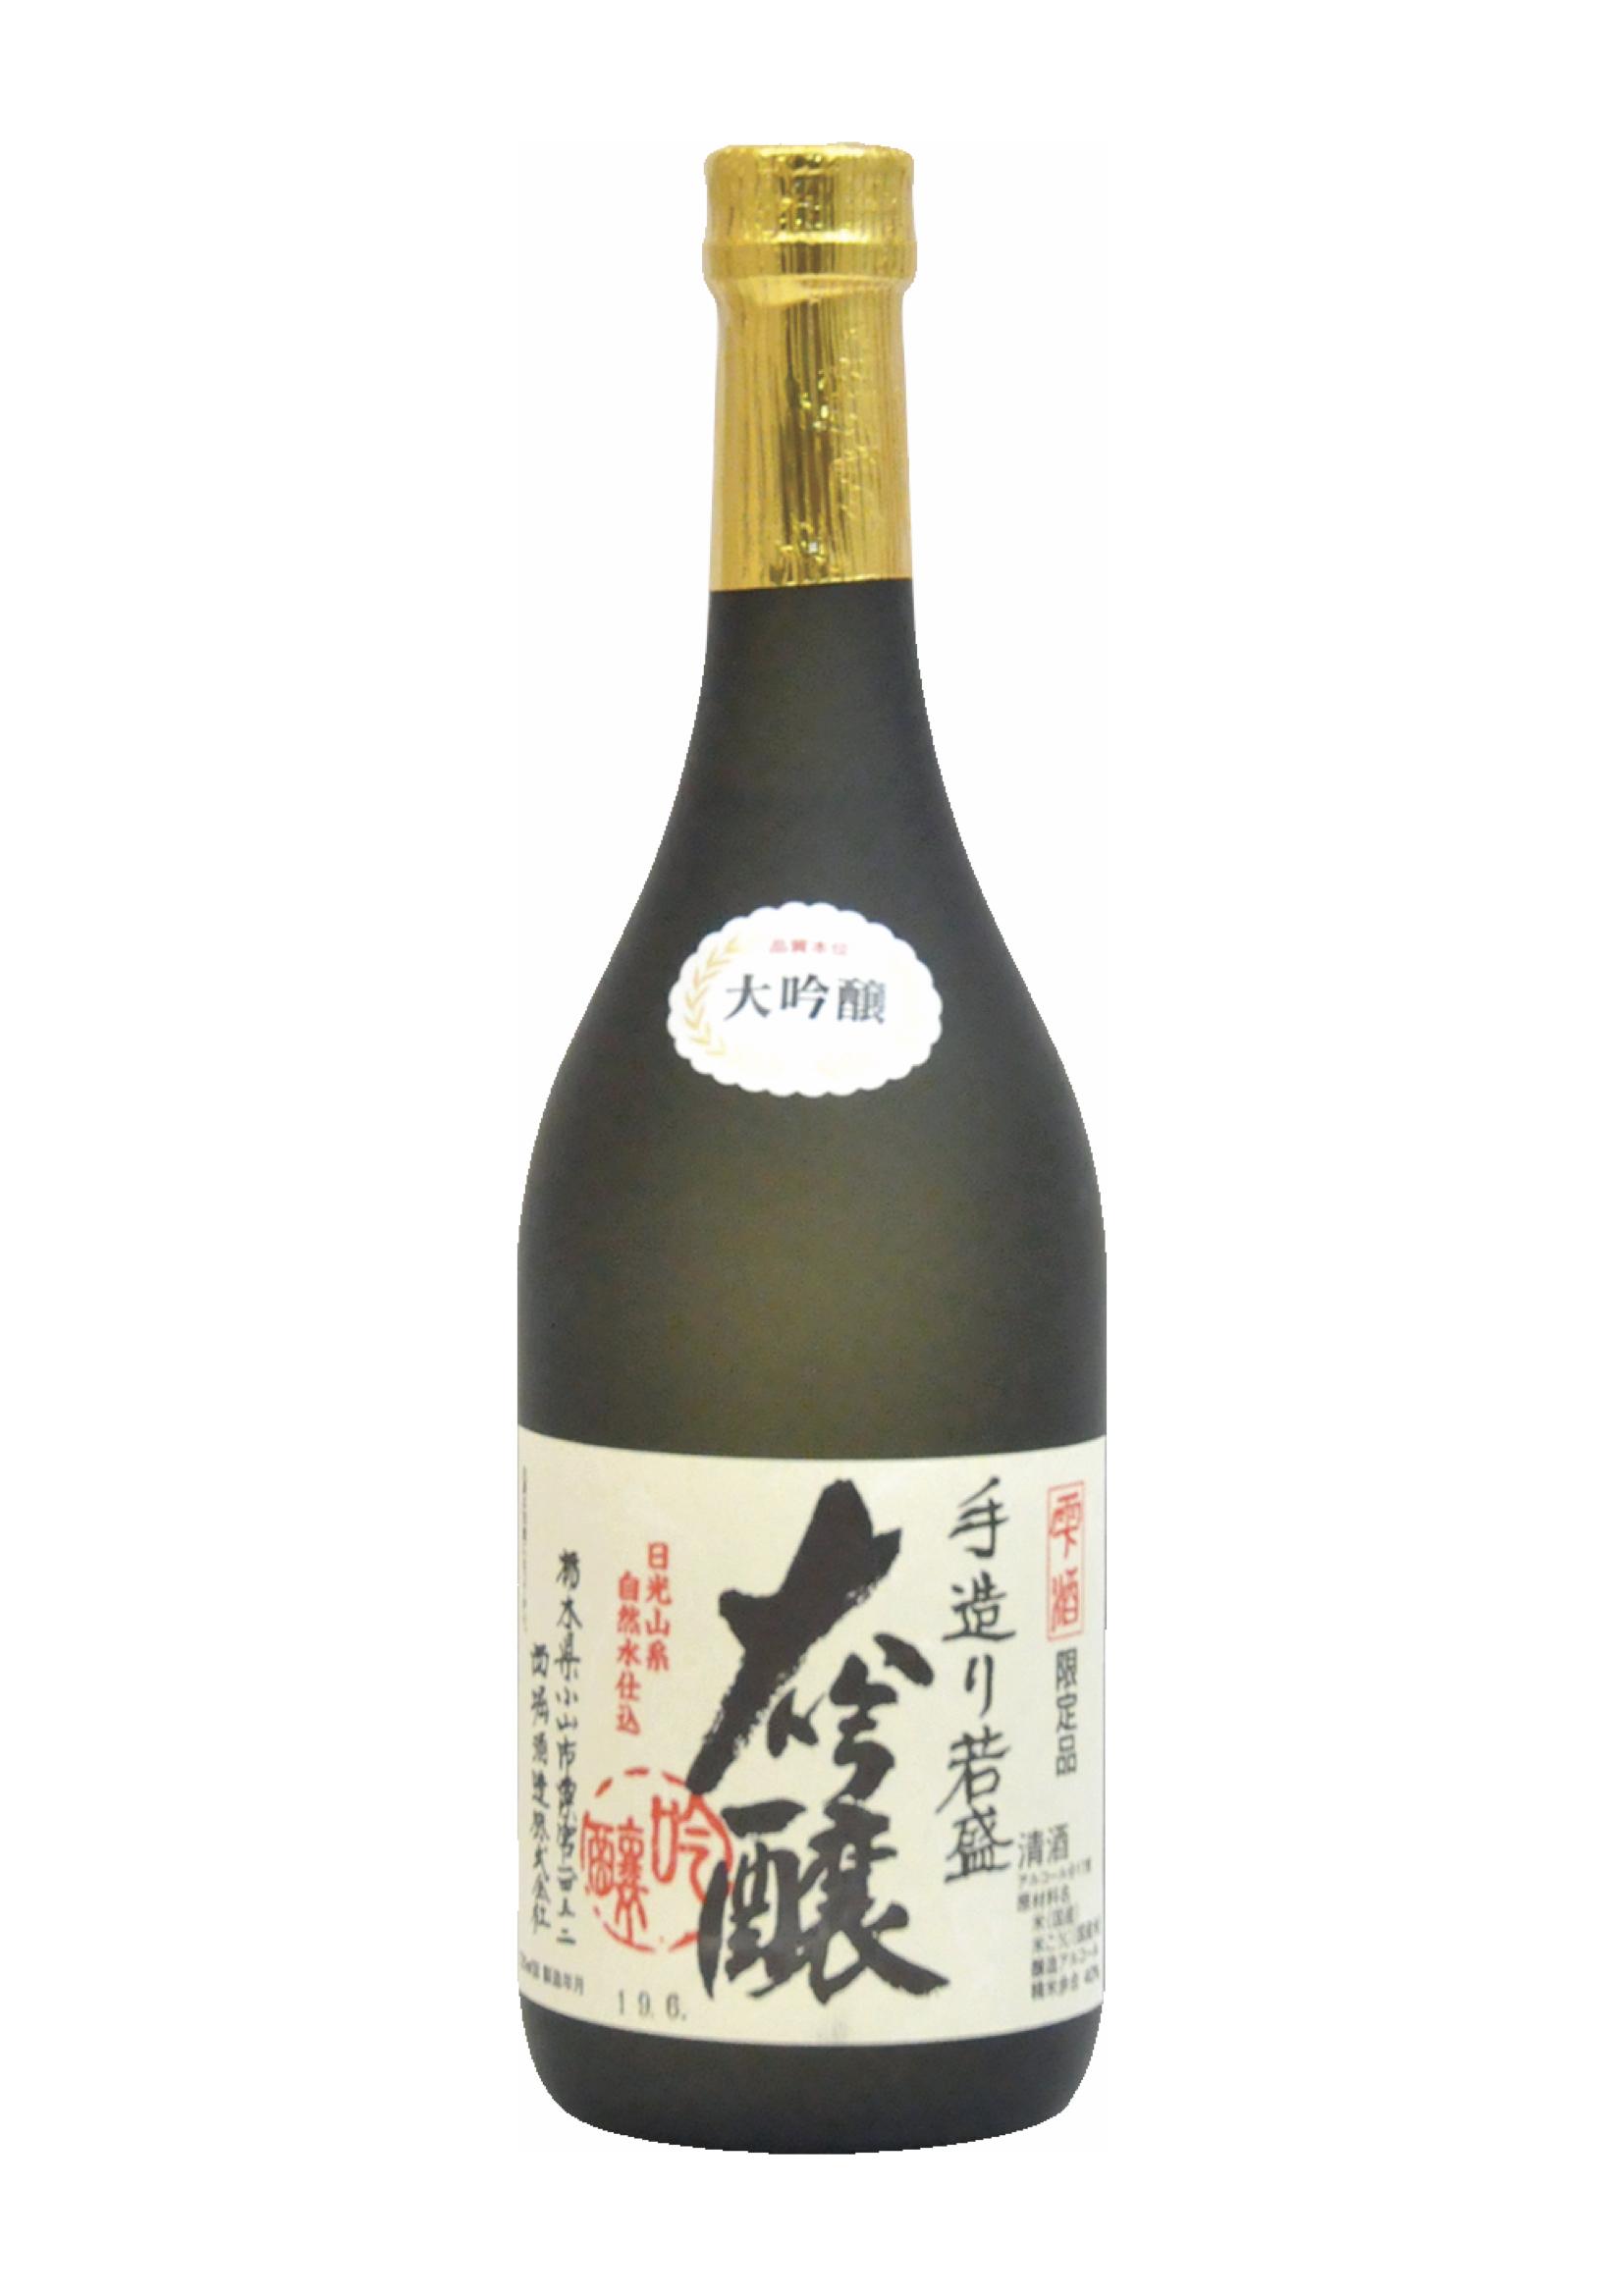 wakazakari-daiginjo-720